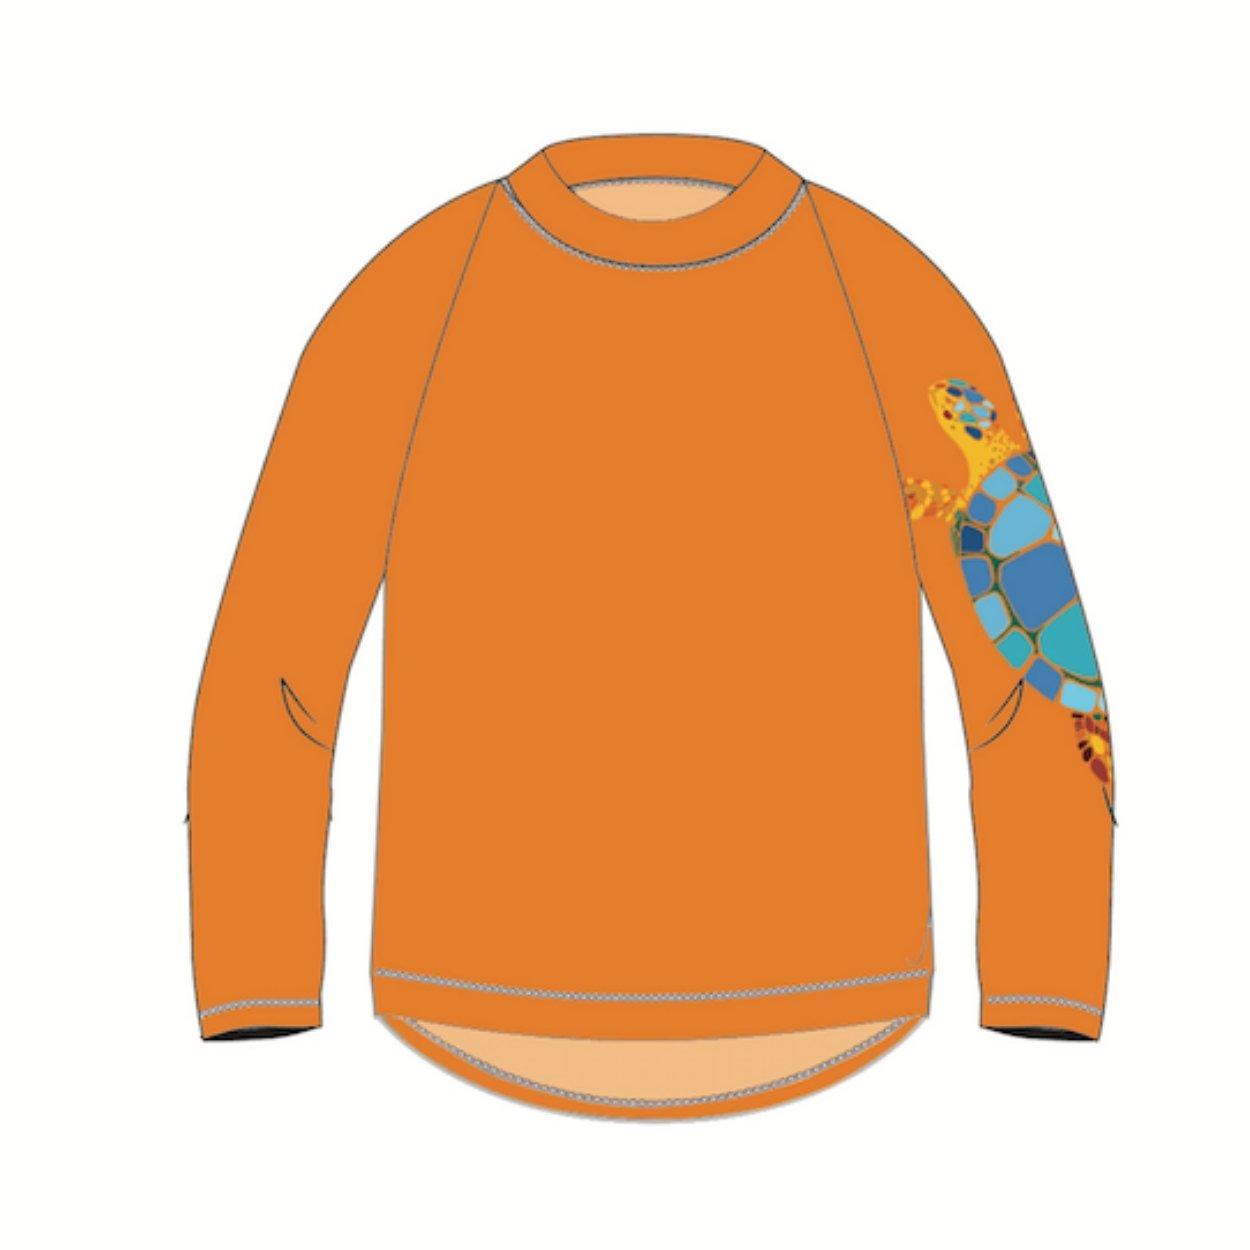 Turtle Long Sleeve Rash Guard Top UPF 50+ for Kids